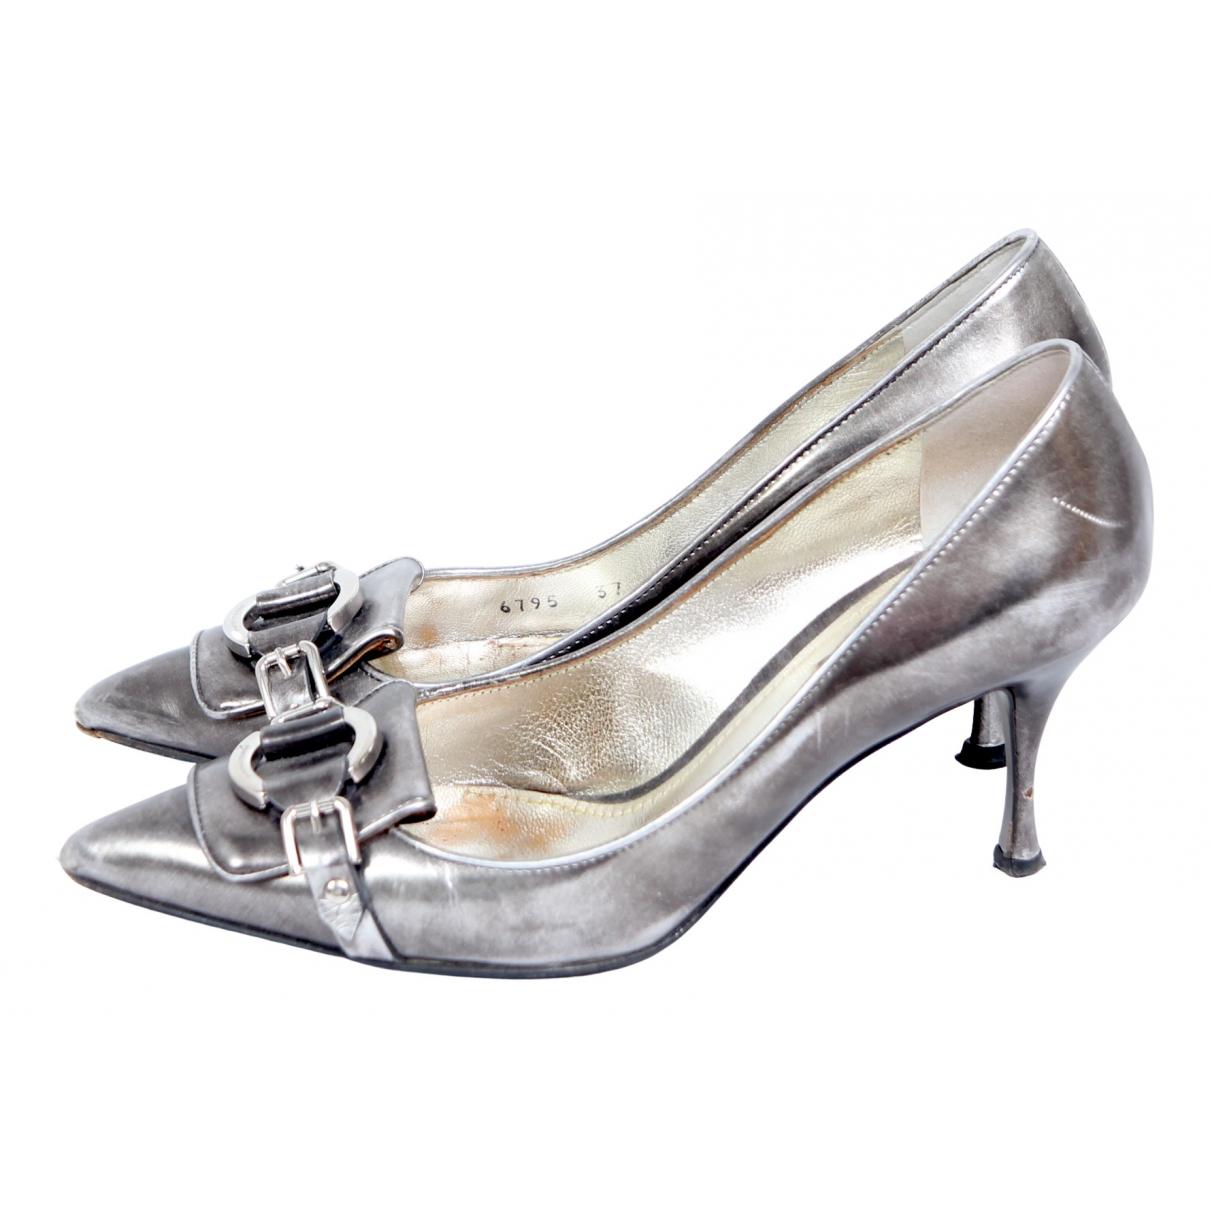 Dolce & Gabbana N Grey Leather Heels for Women 37 EU